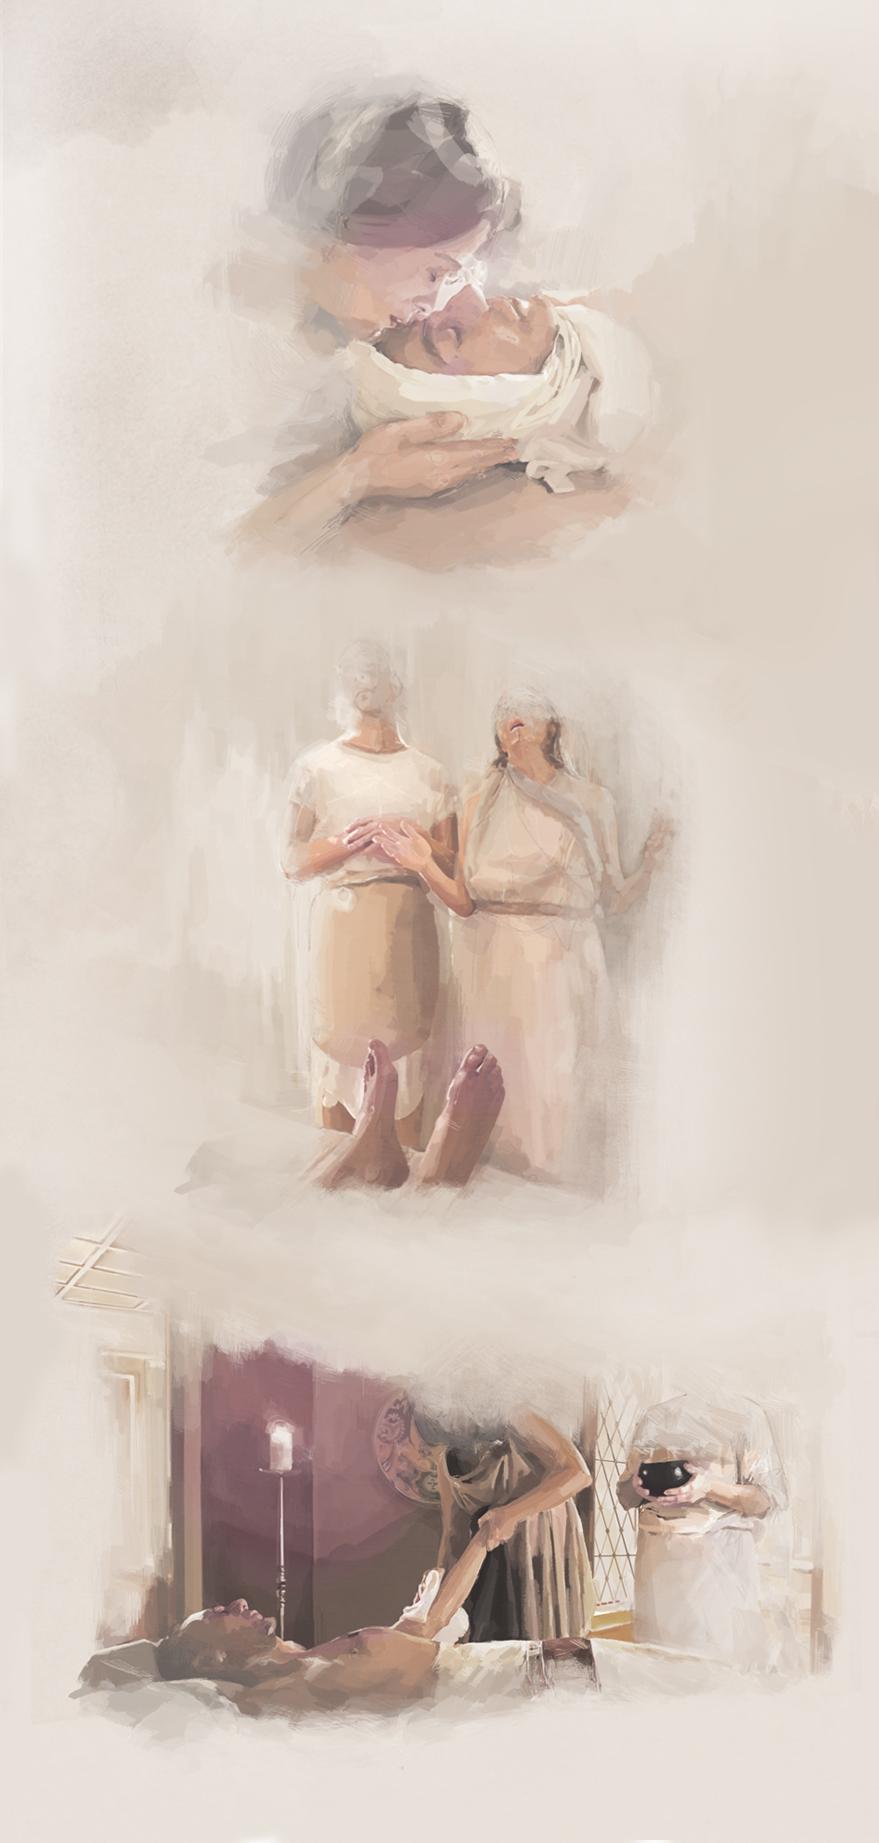 ilustraciones-funeral-romano-julio-cesar-mask-almu-cuesta.jpg